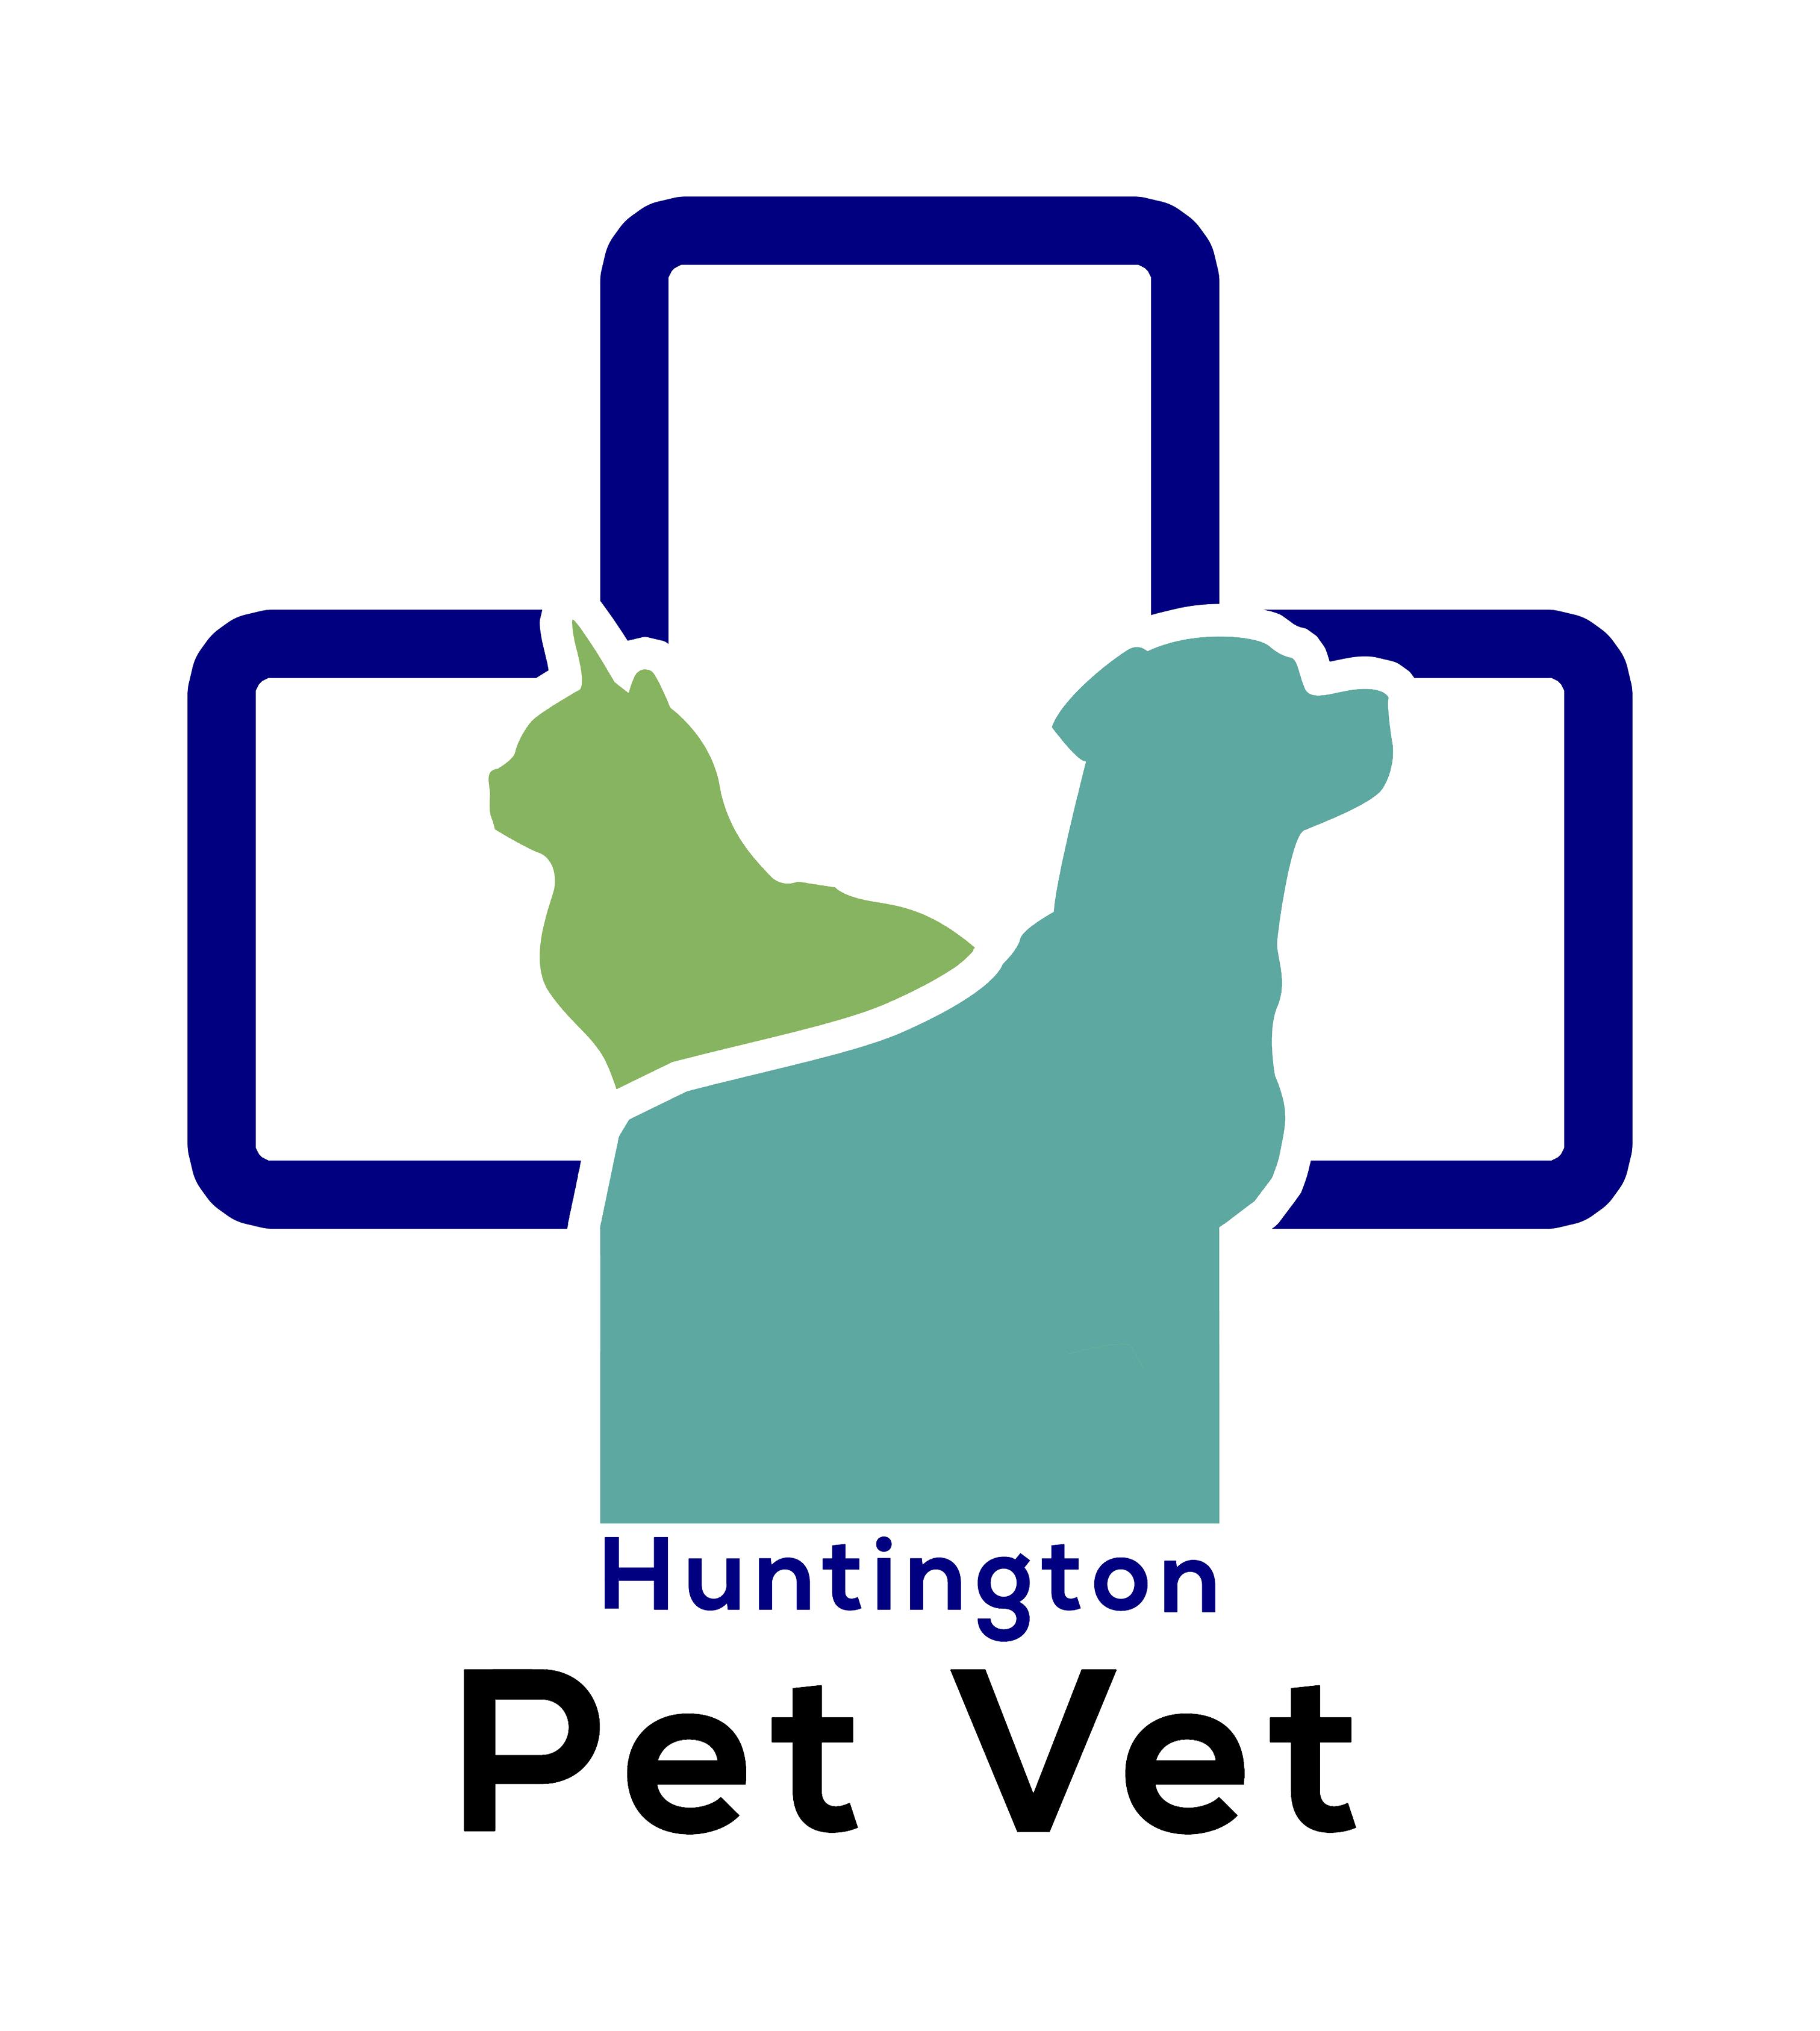 Huntington beach pet vet. Clipart lake lake animal